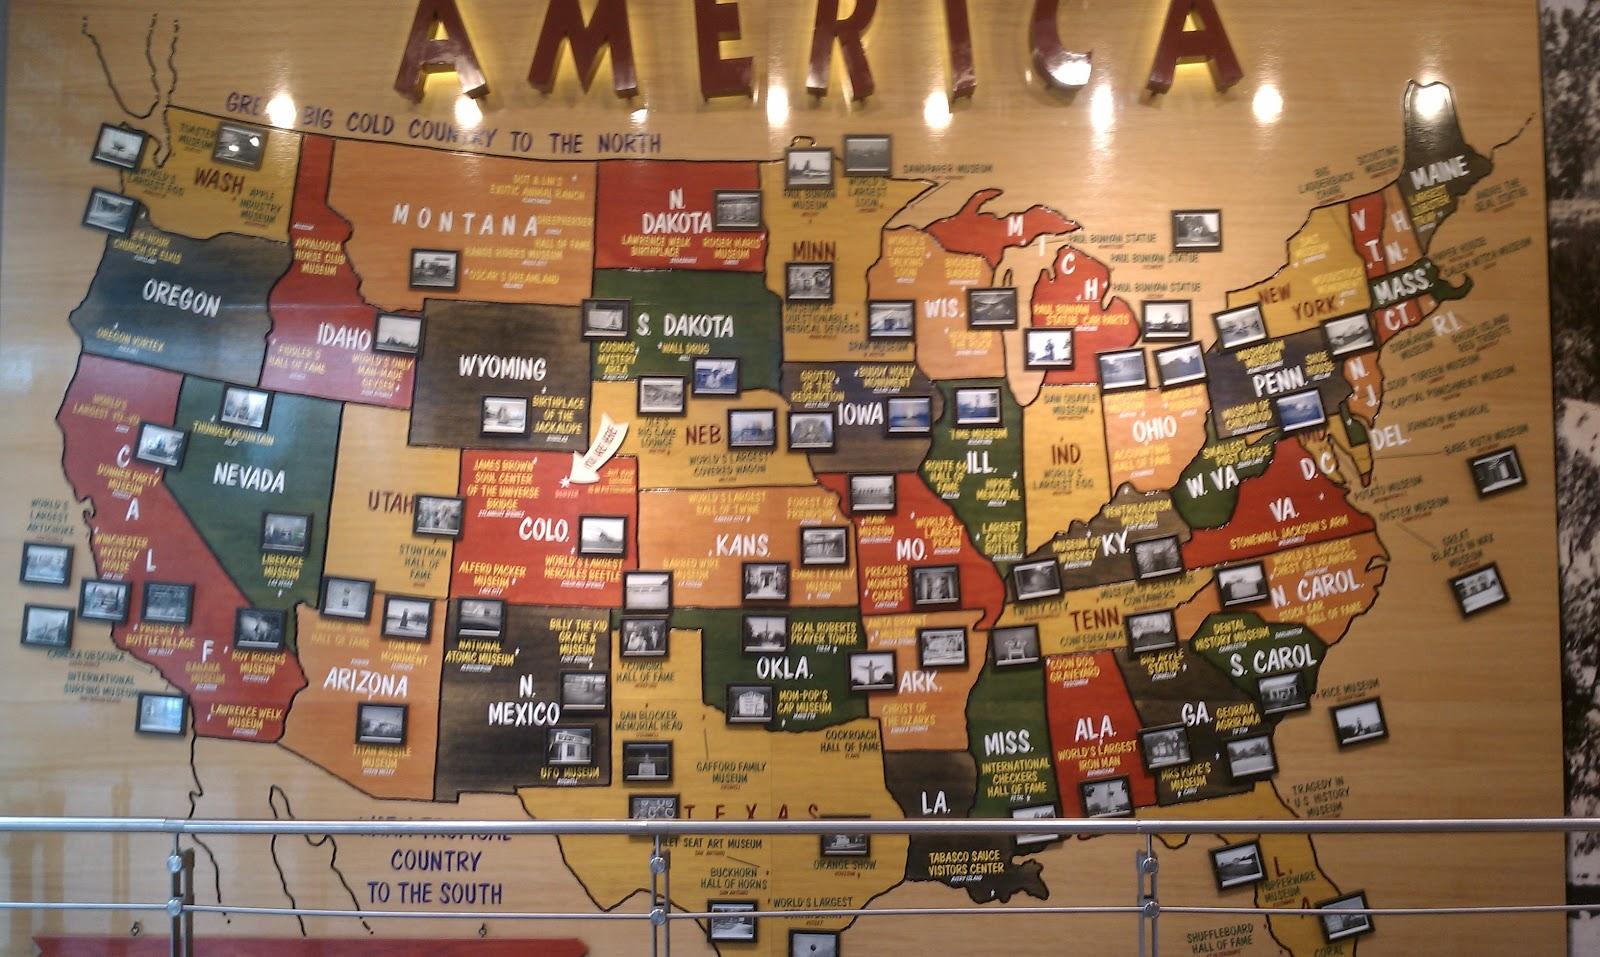 Denver international airport car rental hours 10